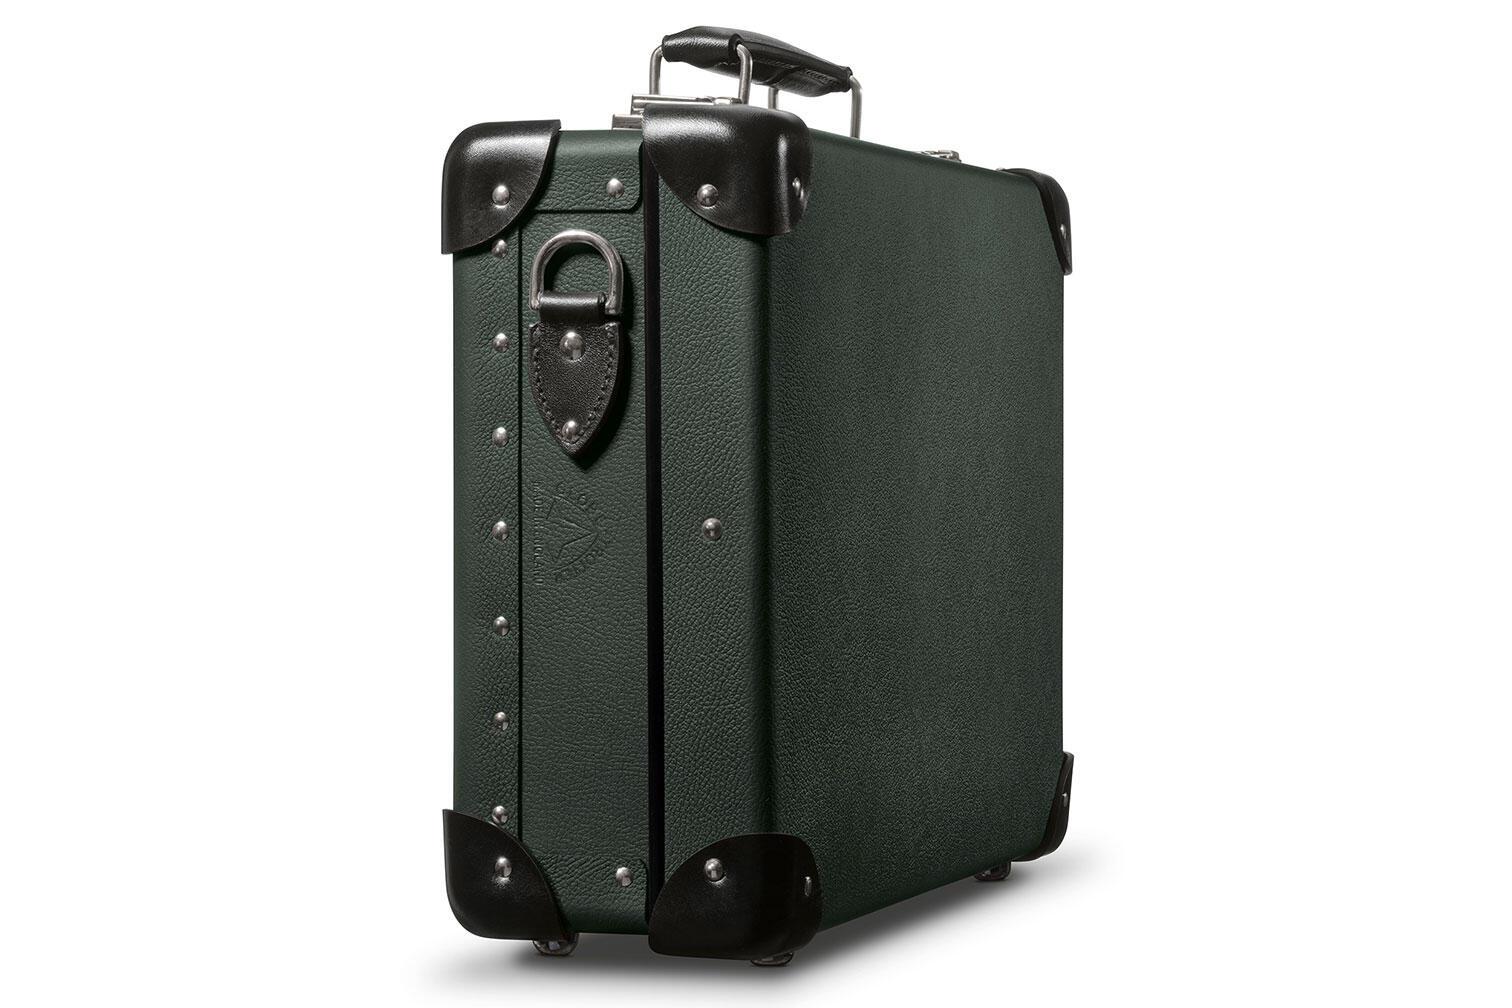 Leica Q2 007 Edition case